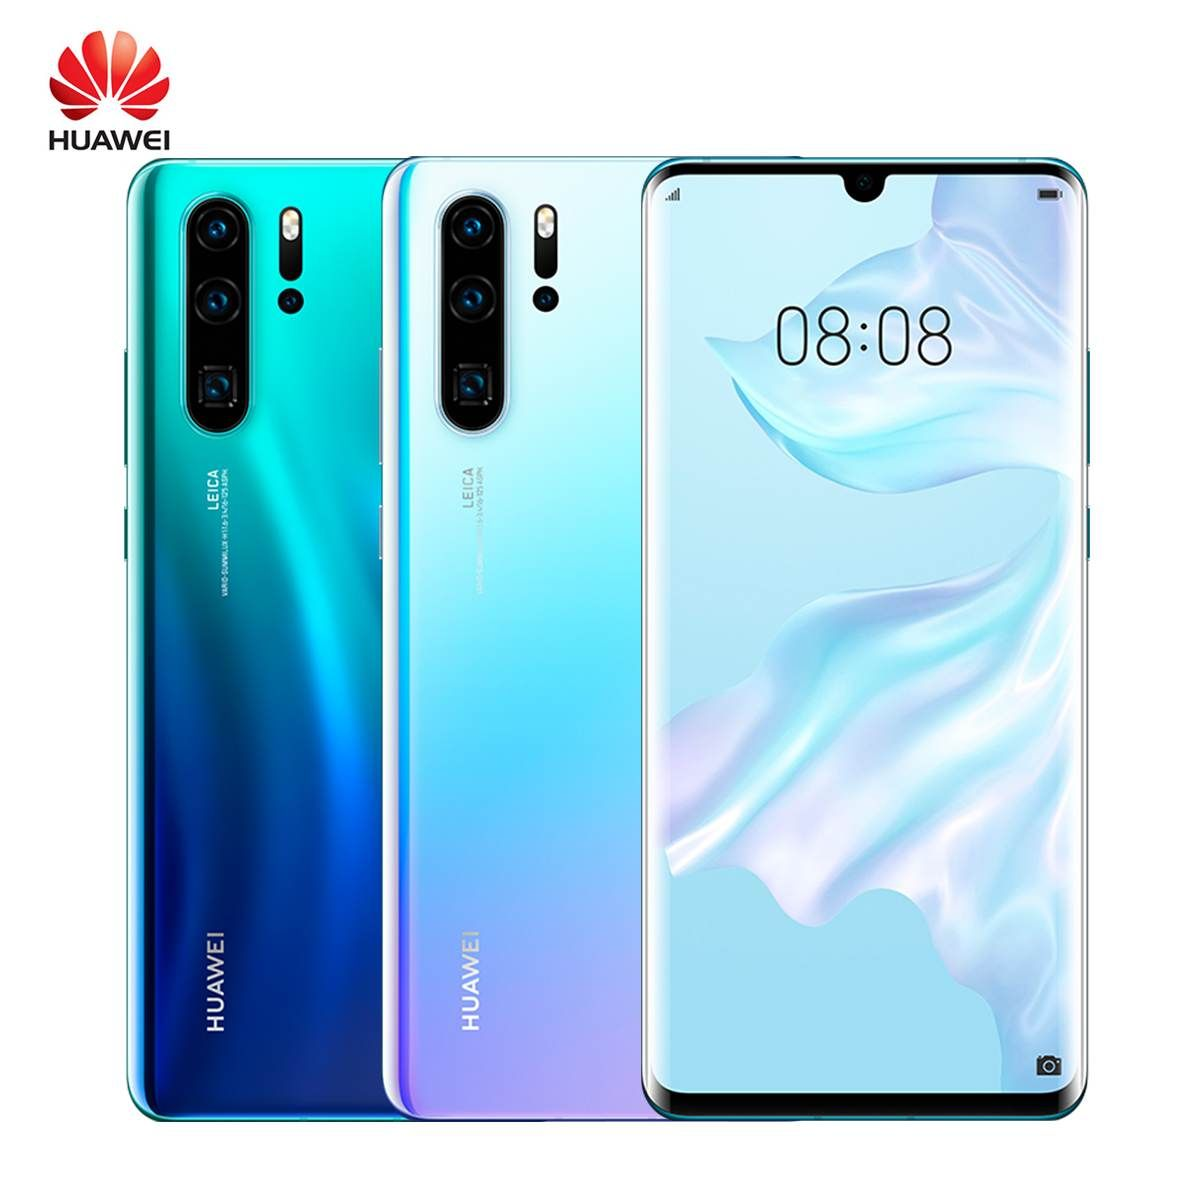 Huawei P30 Pro 8 + 256GB Handy 6,47 ''Full Bildschirm OLED Kirin 980 Smartphone NFC GPS Android 9.1 5 kameras 40MP + 32MP